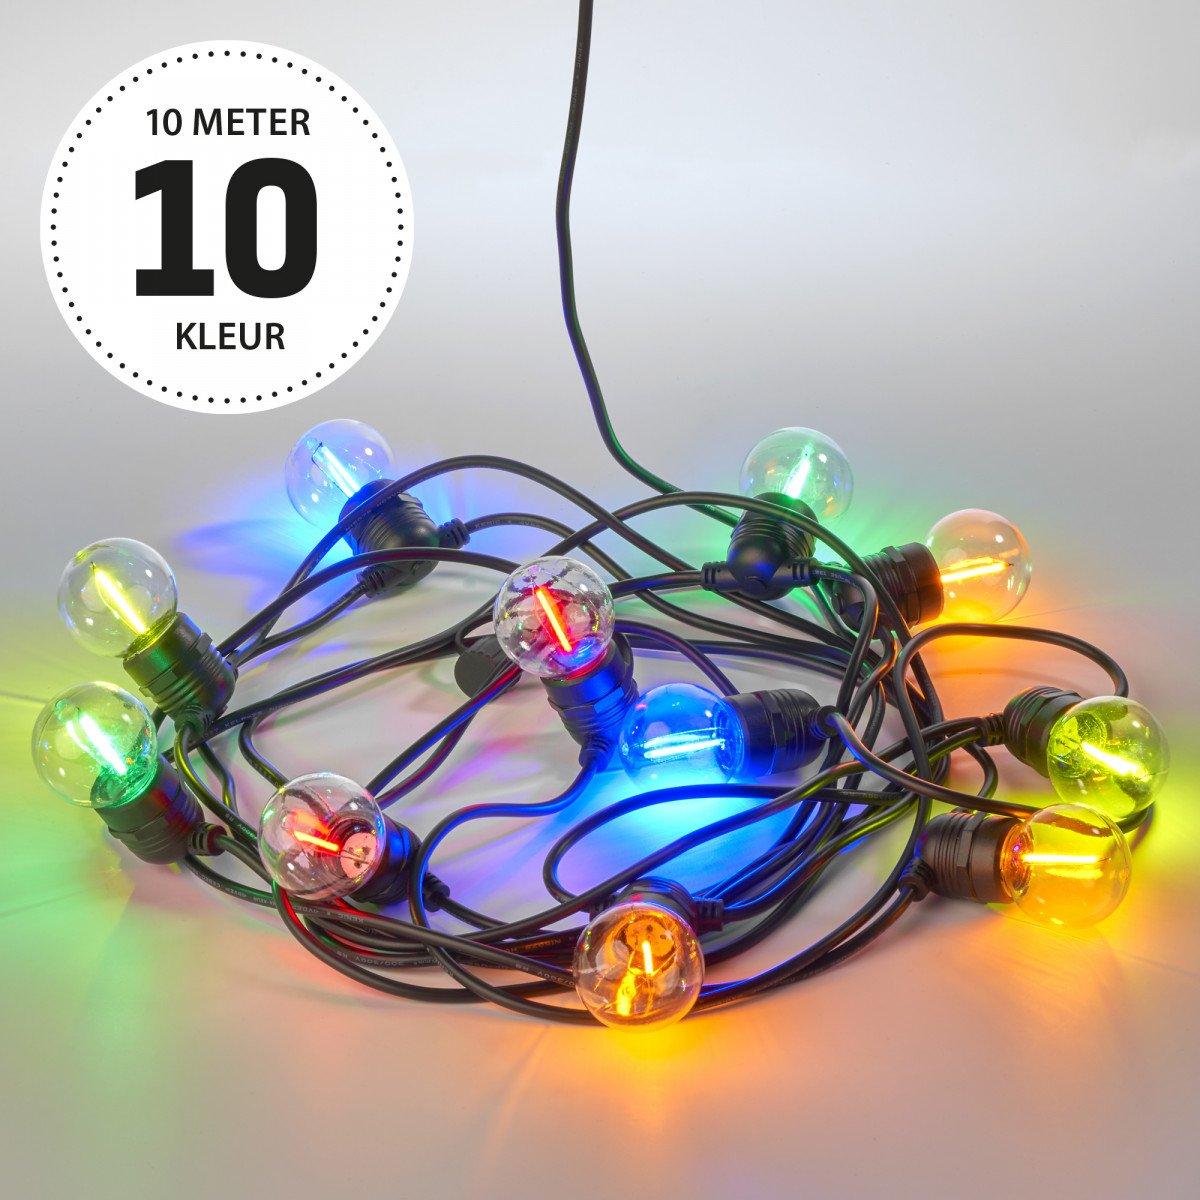 Party 10m Lichterkette Farbig inkl. Led 10 m / 15 Leds